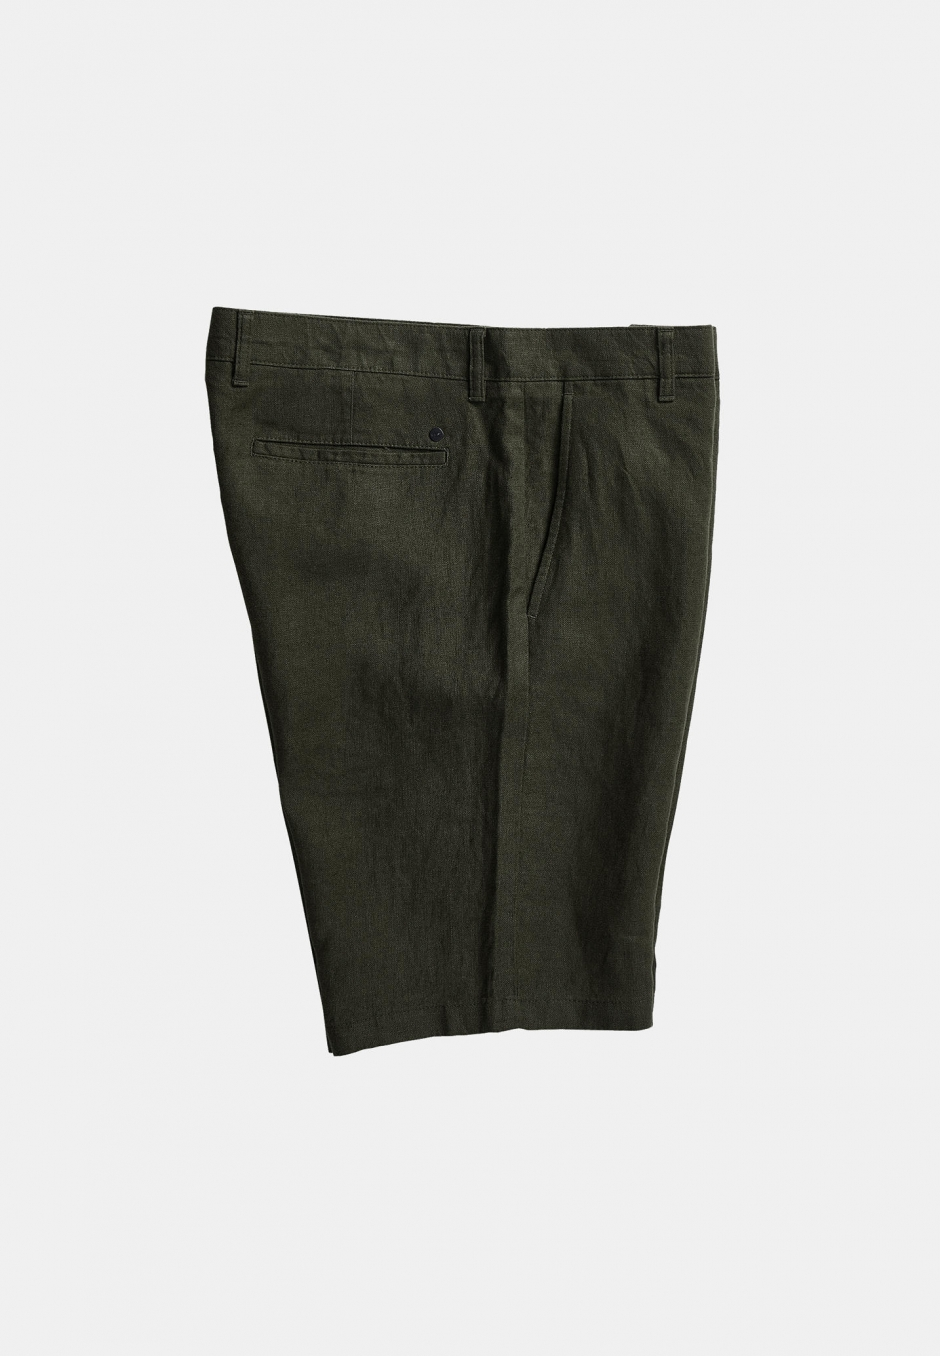 NN07 Crown 1196 Linen Shorts